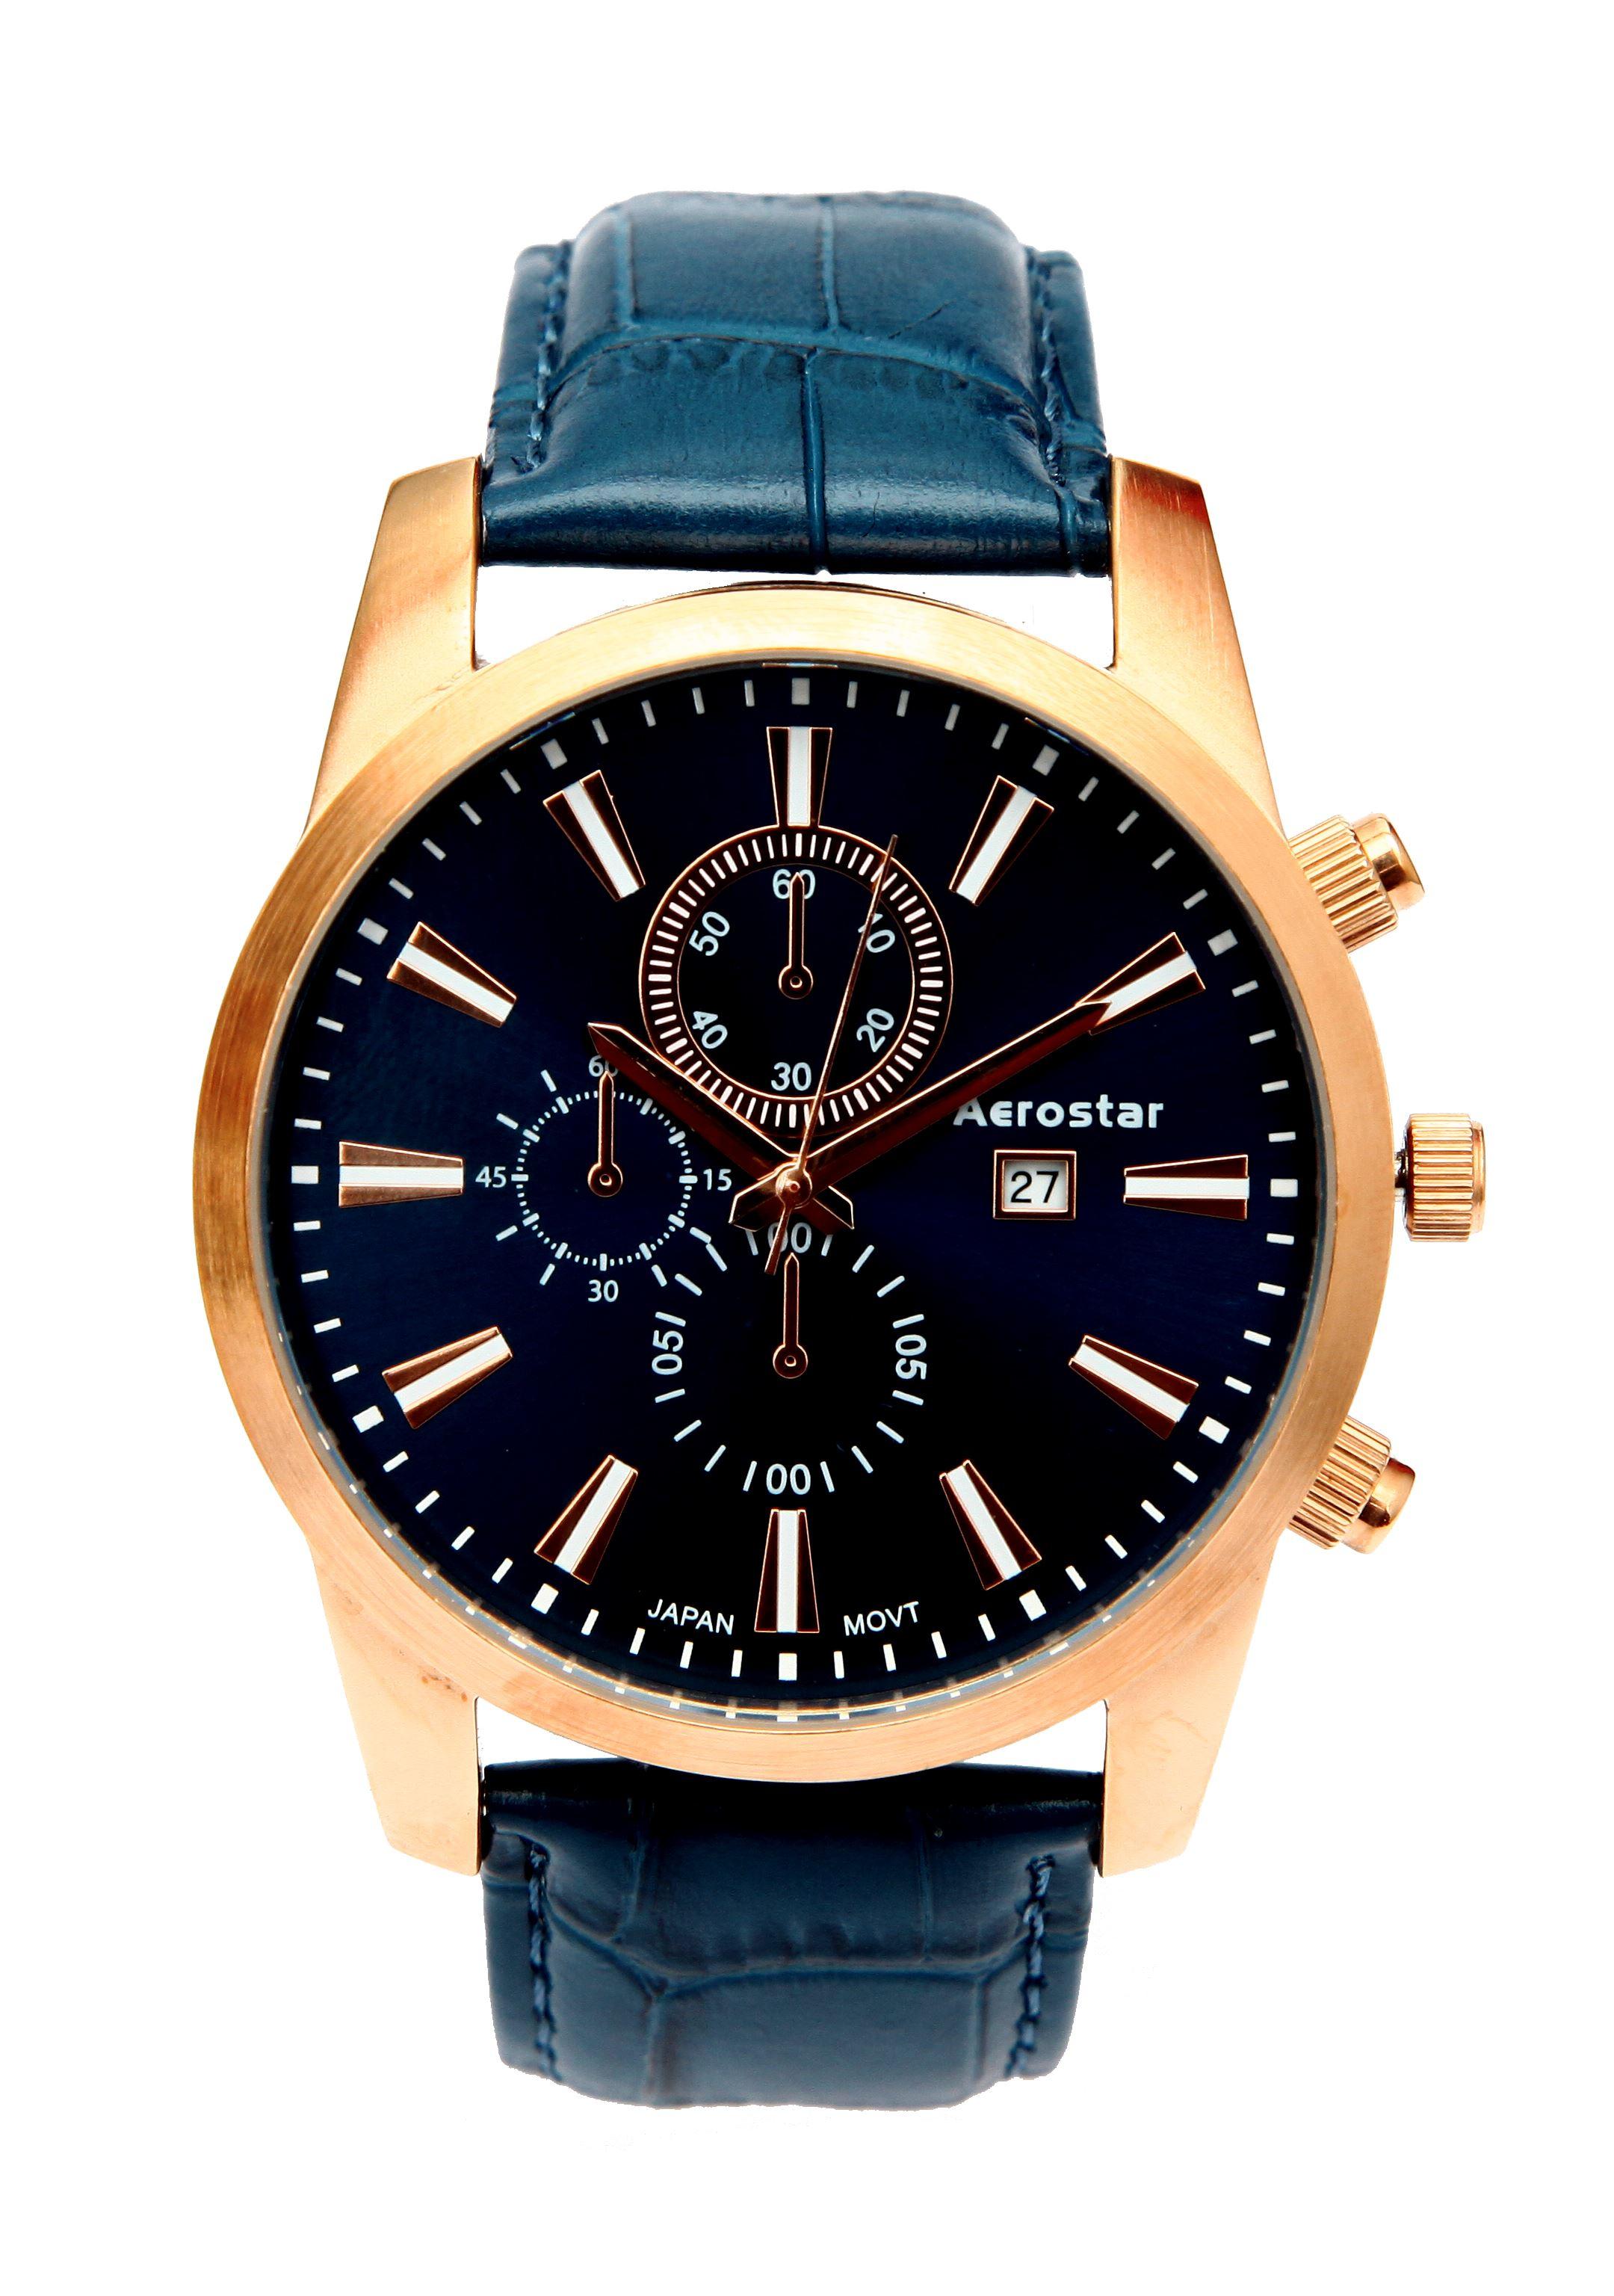 81249eb6f181 Aerostar - Reloj Caballero 26135 Azul y Oro